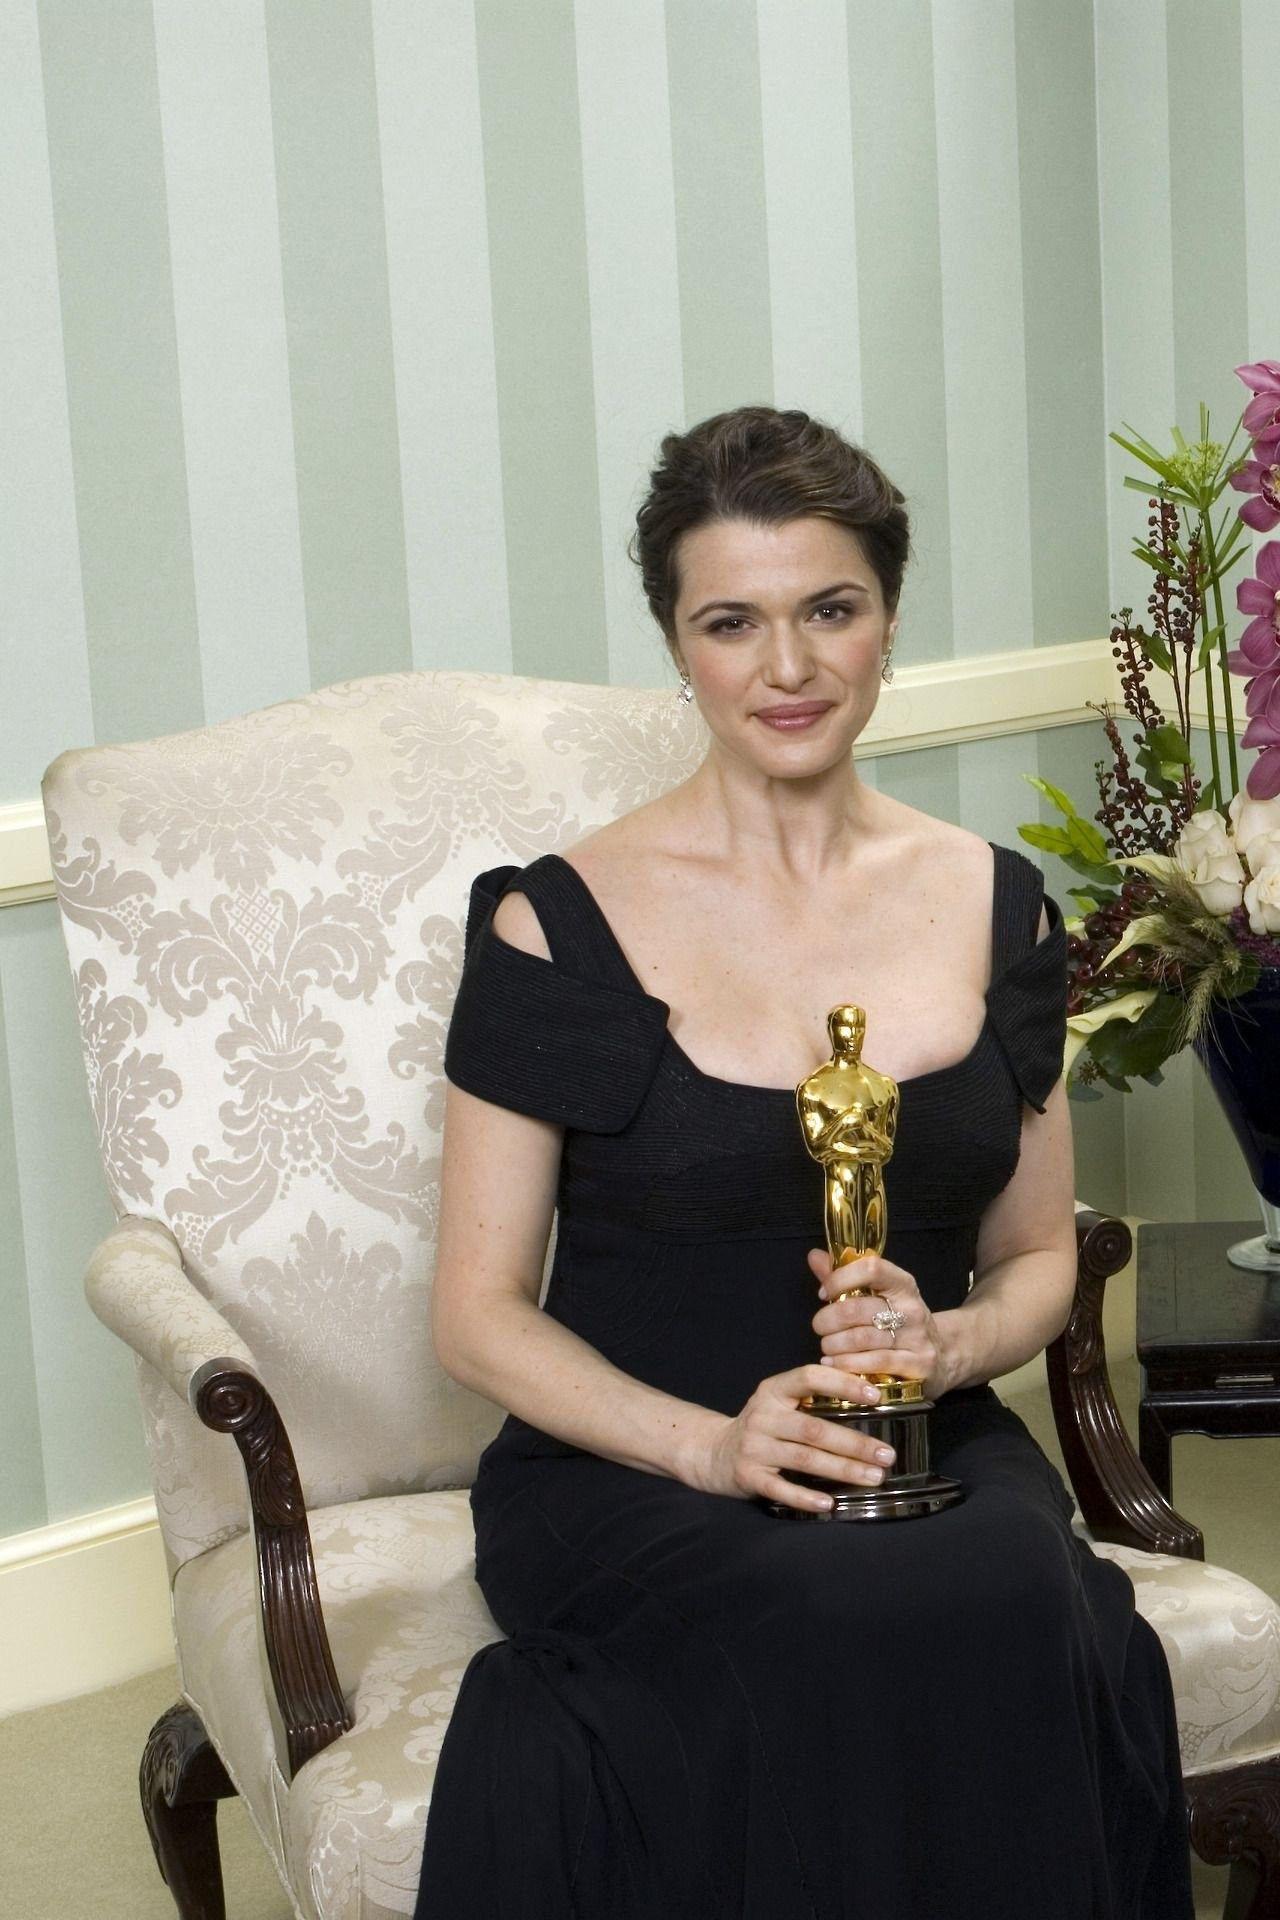 Pin by cici on Rachel Weisz | Oscar fashion, Rachel weisz ...